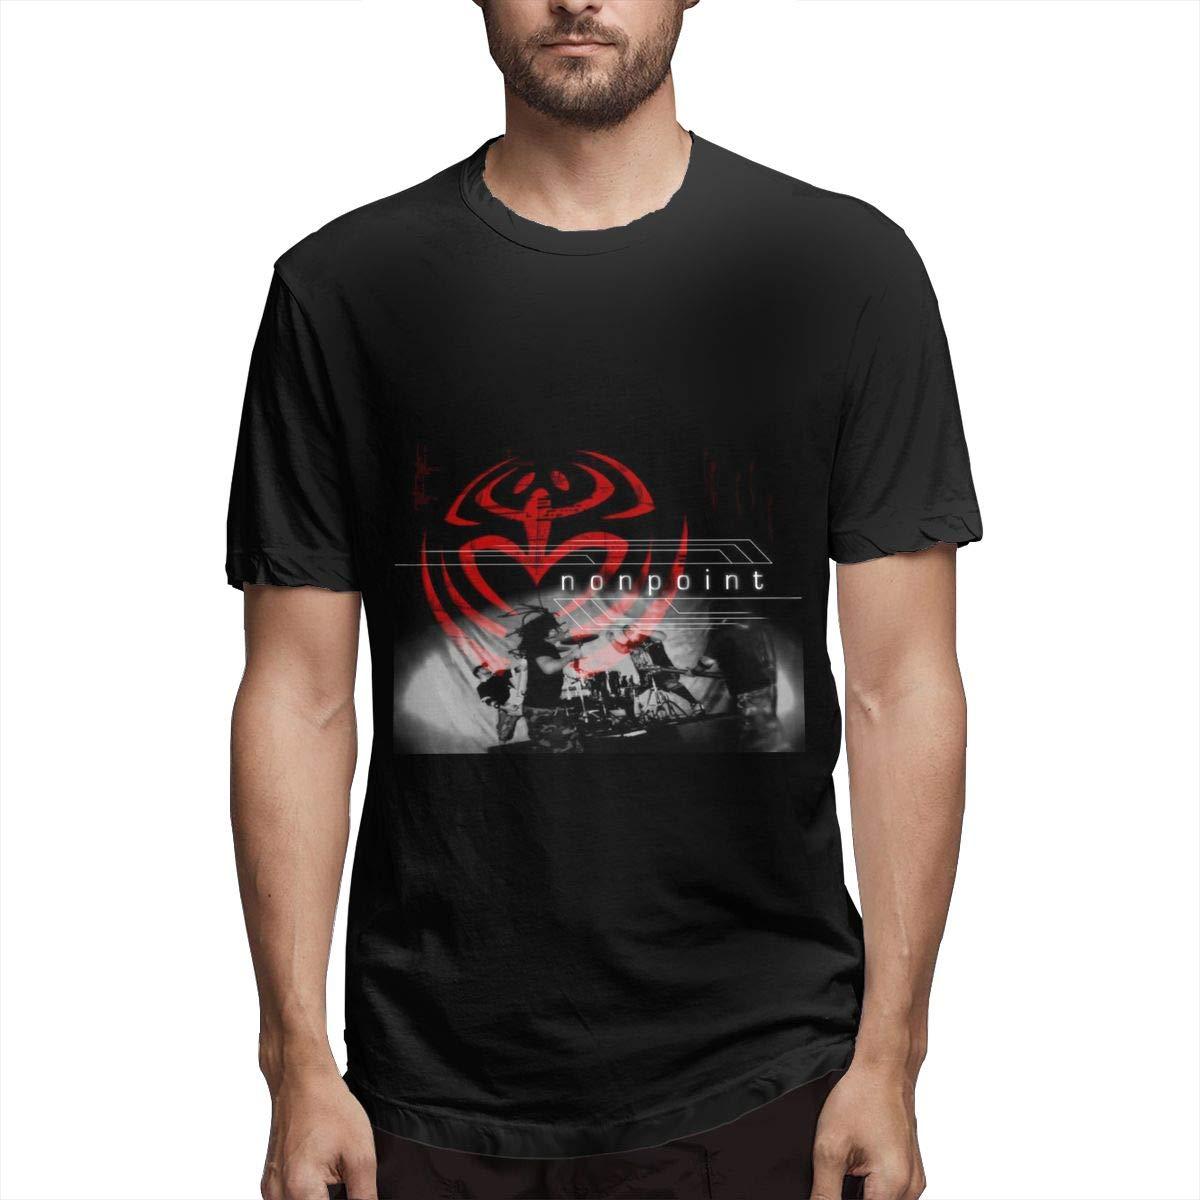 Lihehen Mans Afrociberdelia Retro Printing Round Neck Ts Shirts